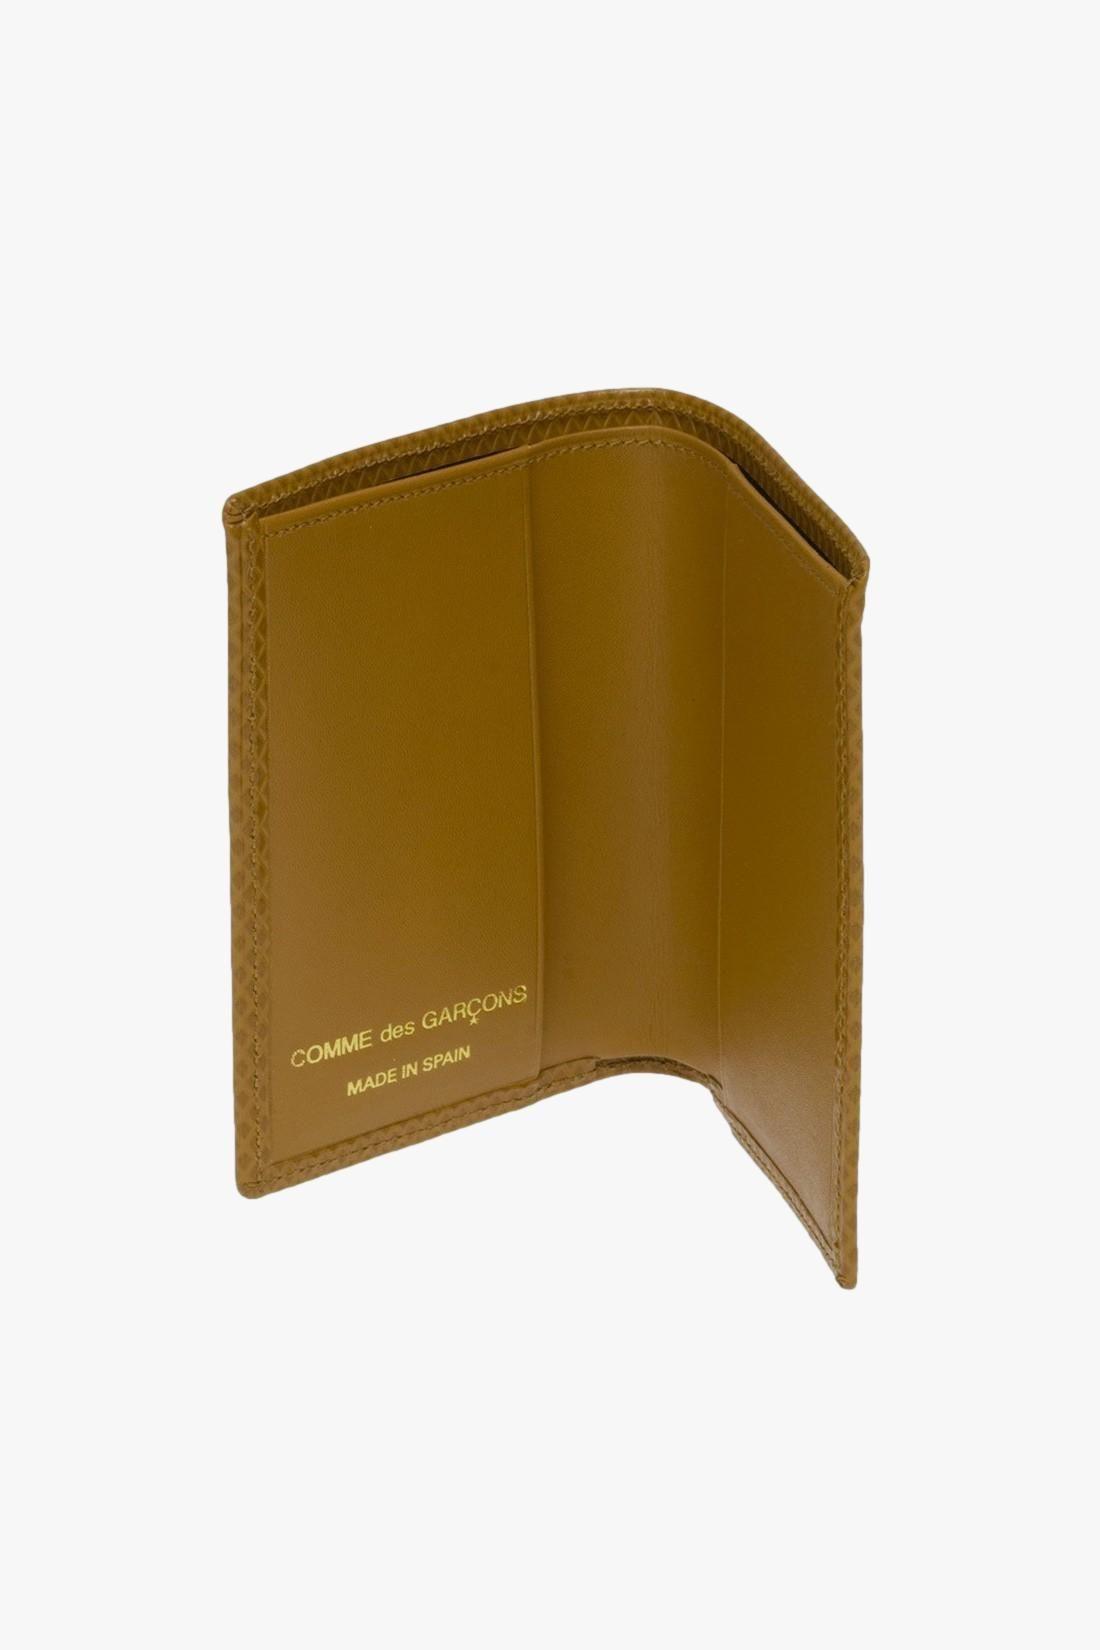 COMME DES GARÇONS WALLETS / Cdg luxury group sa6400lg Beige